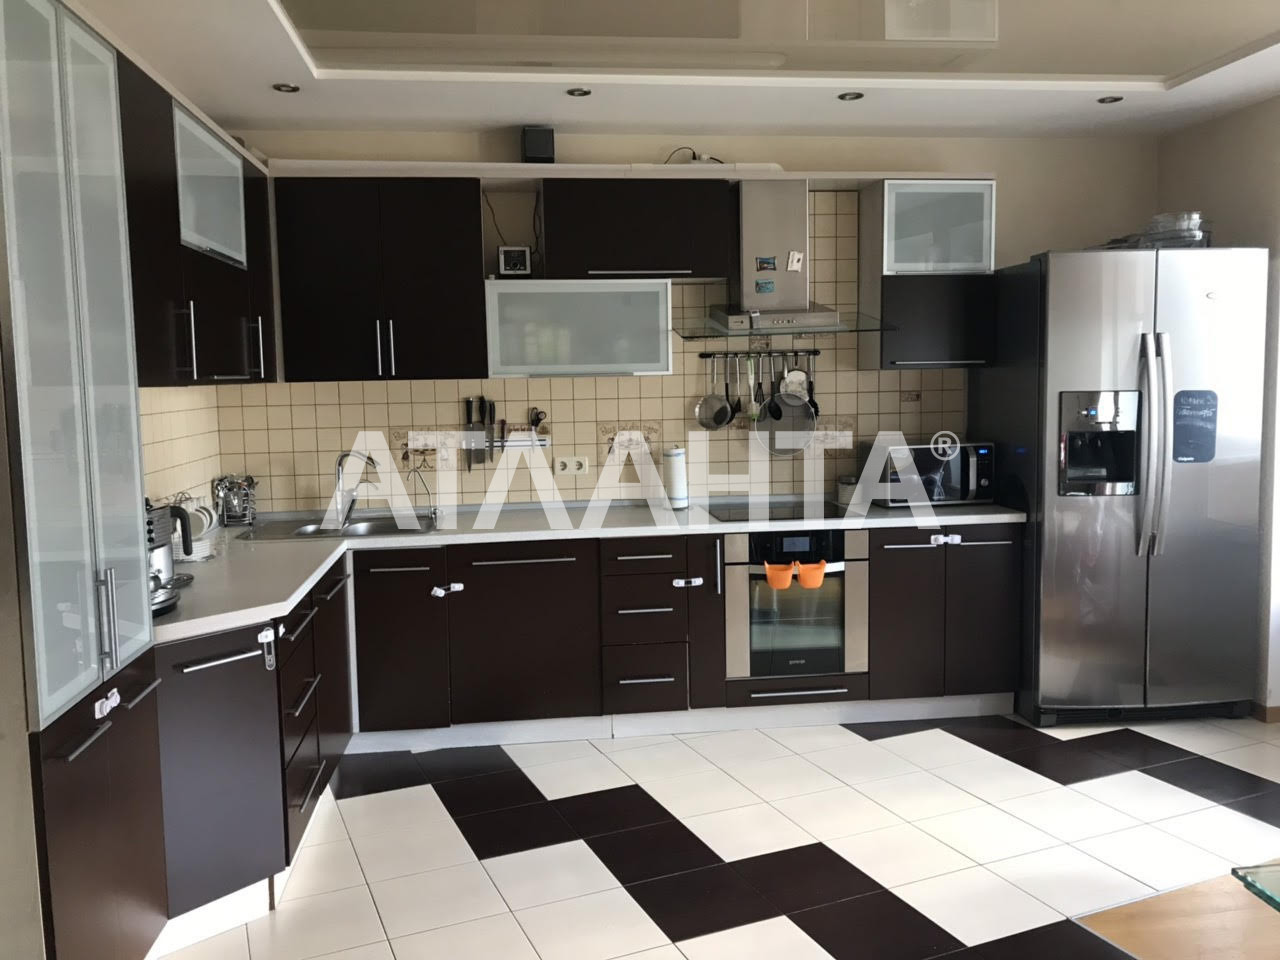 Продается 3-комнатная Квартира на ул. Ул. Ломоносова — 128 000 у.е. (фото №2)